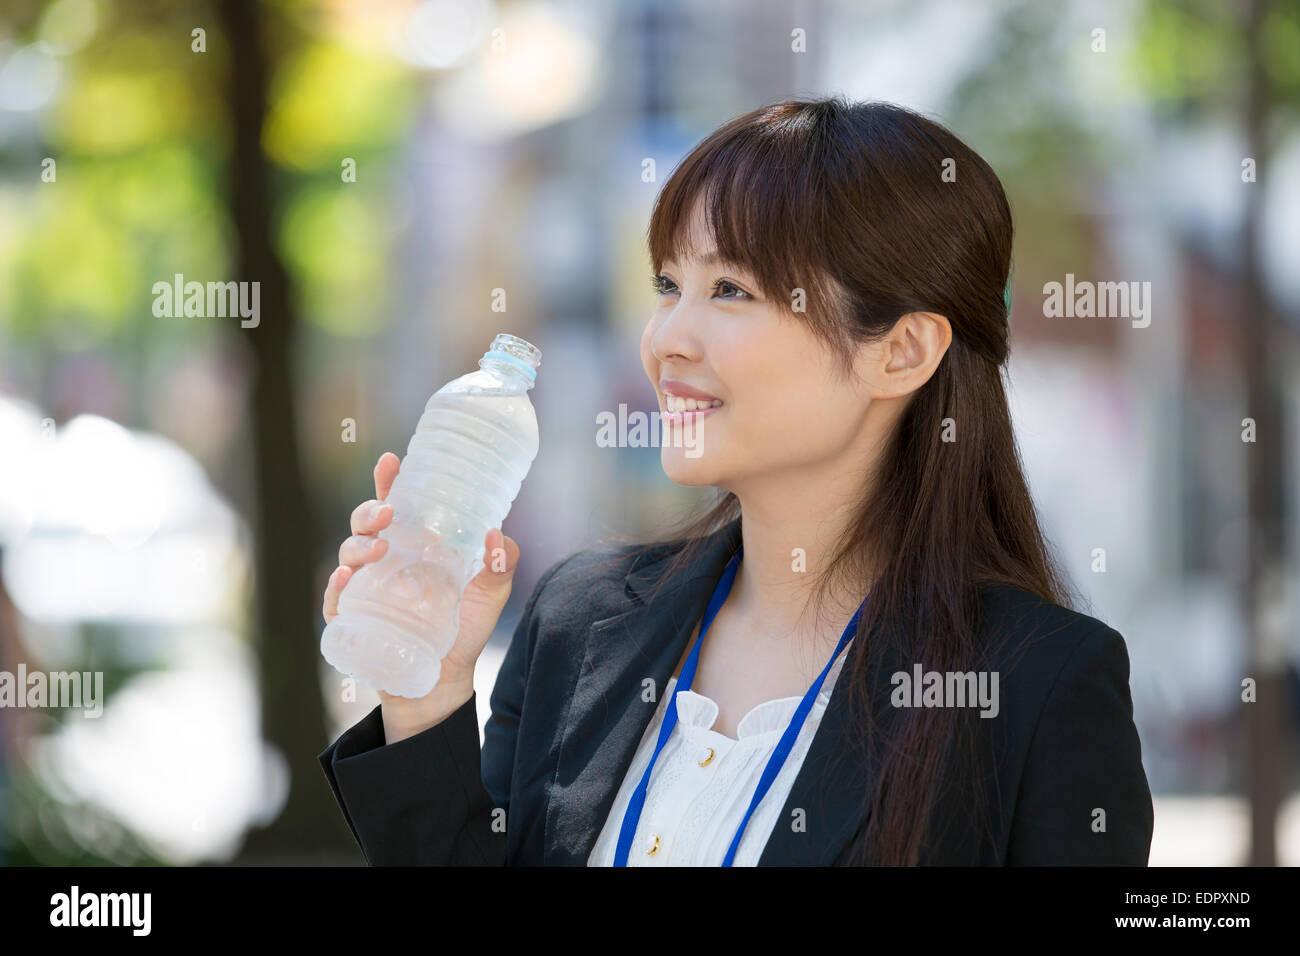 Smiling Businesswoman Holding Bottled Water - Stock Image